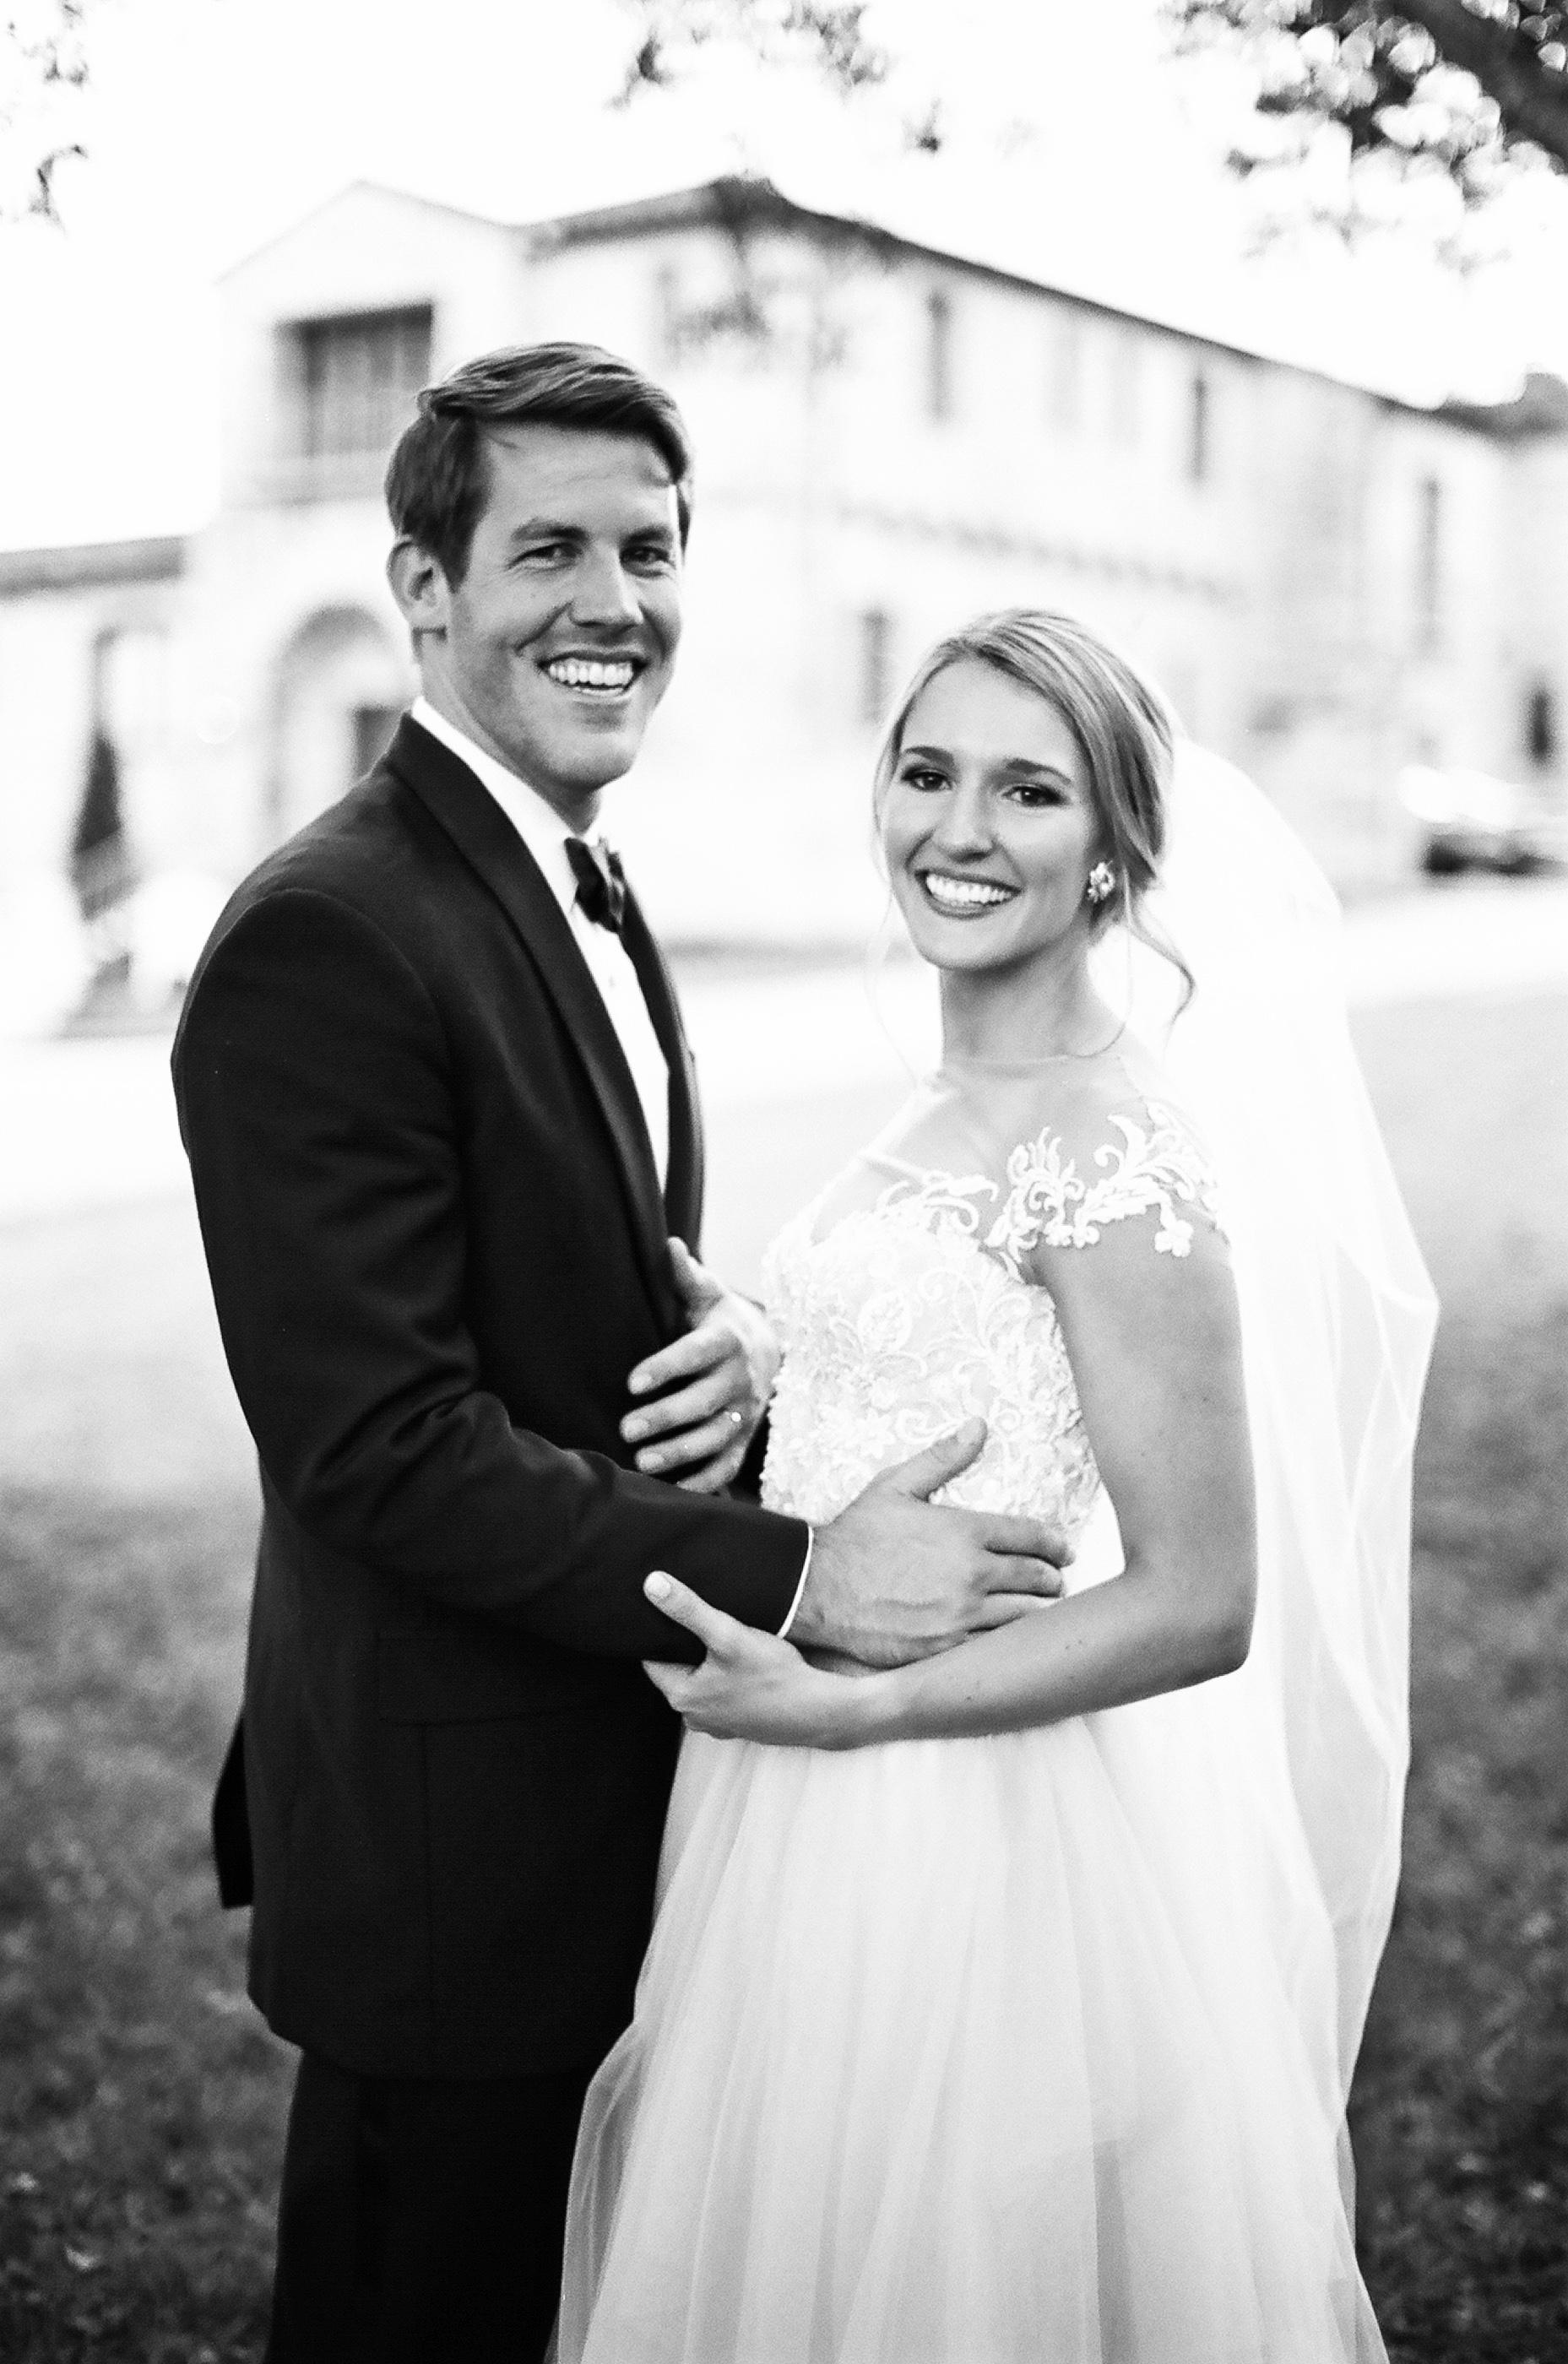 jessika william wedding couple side by side